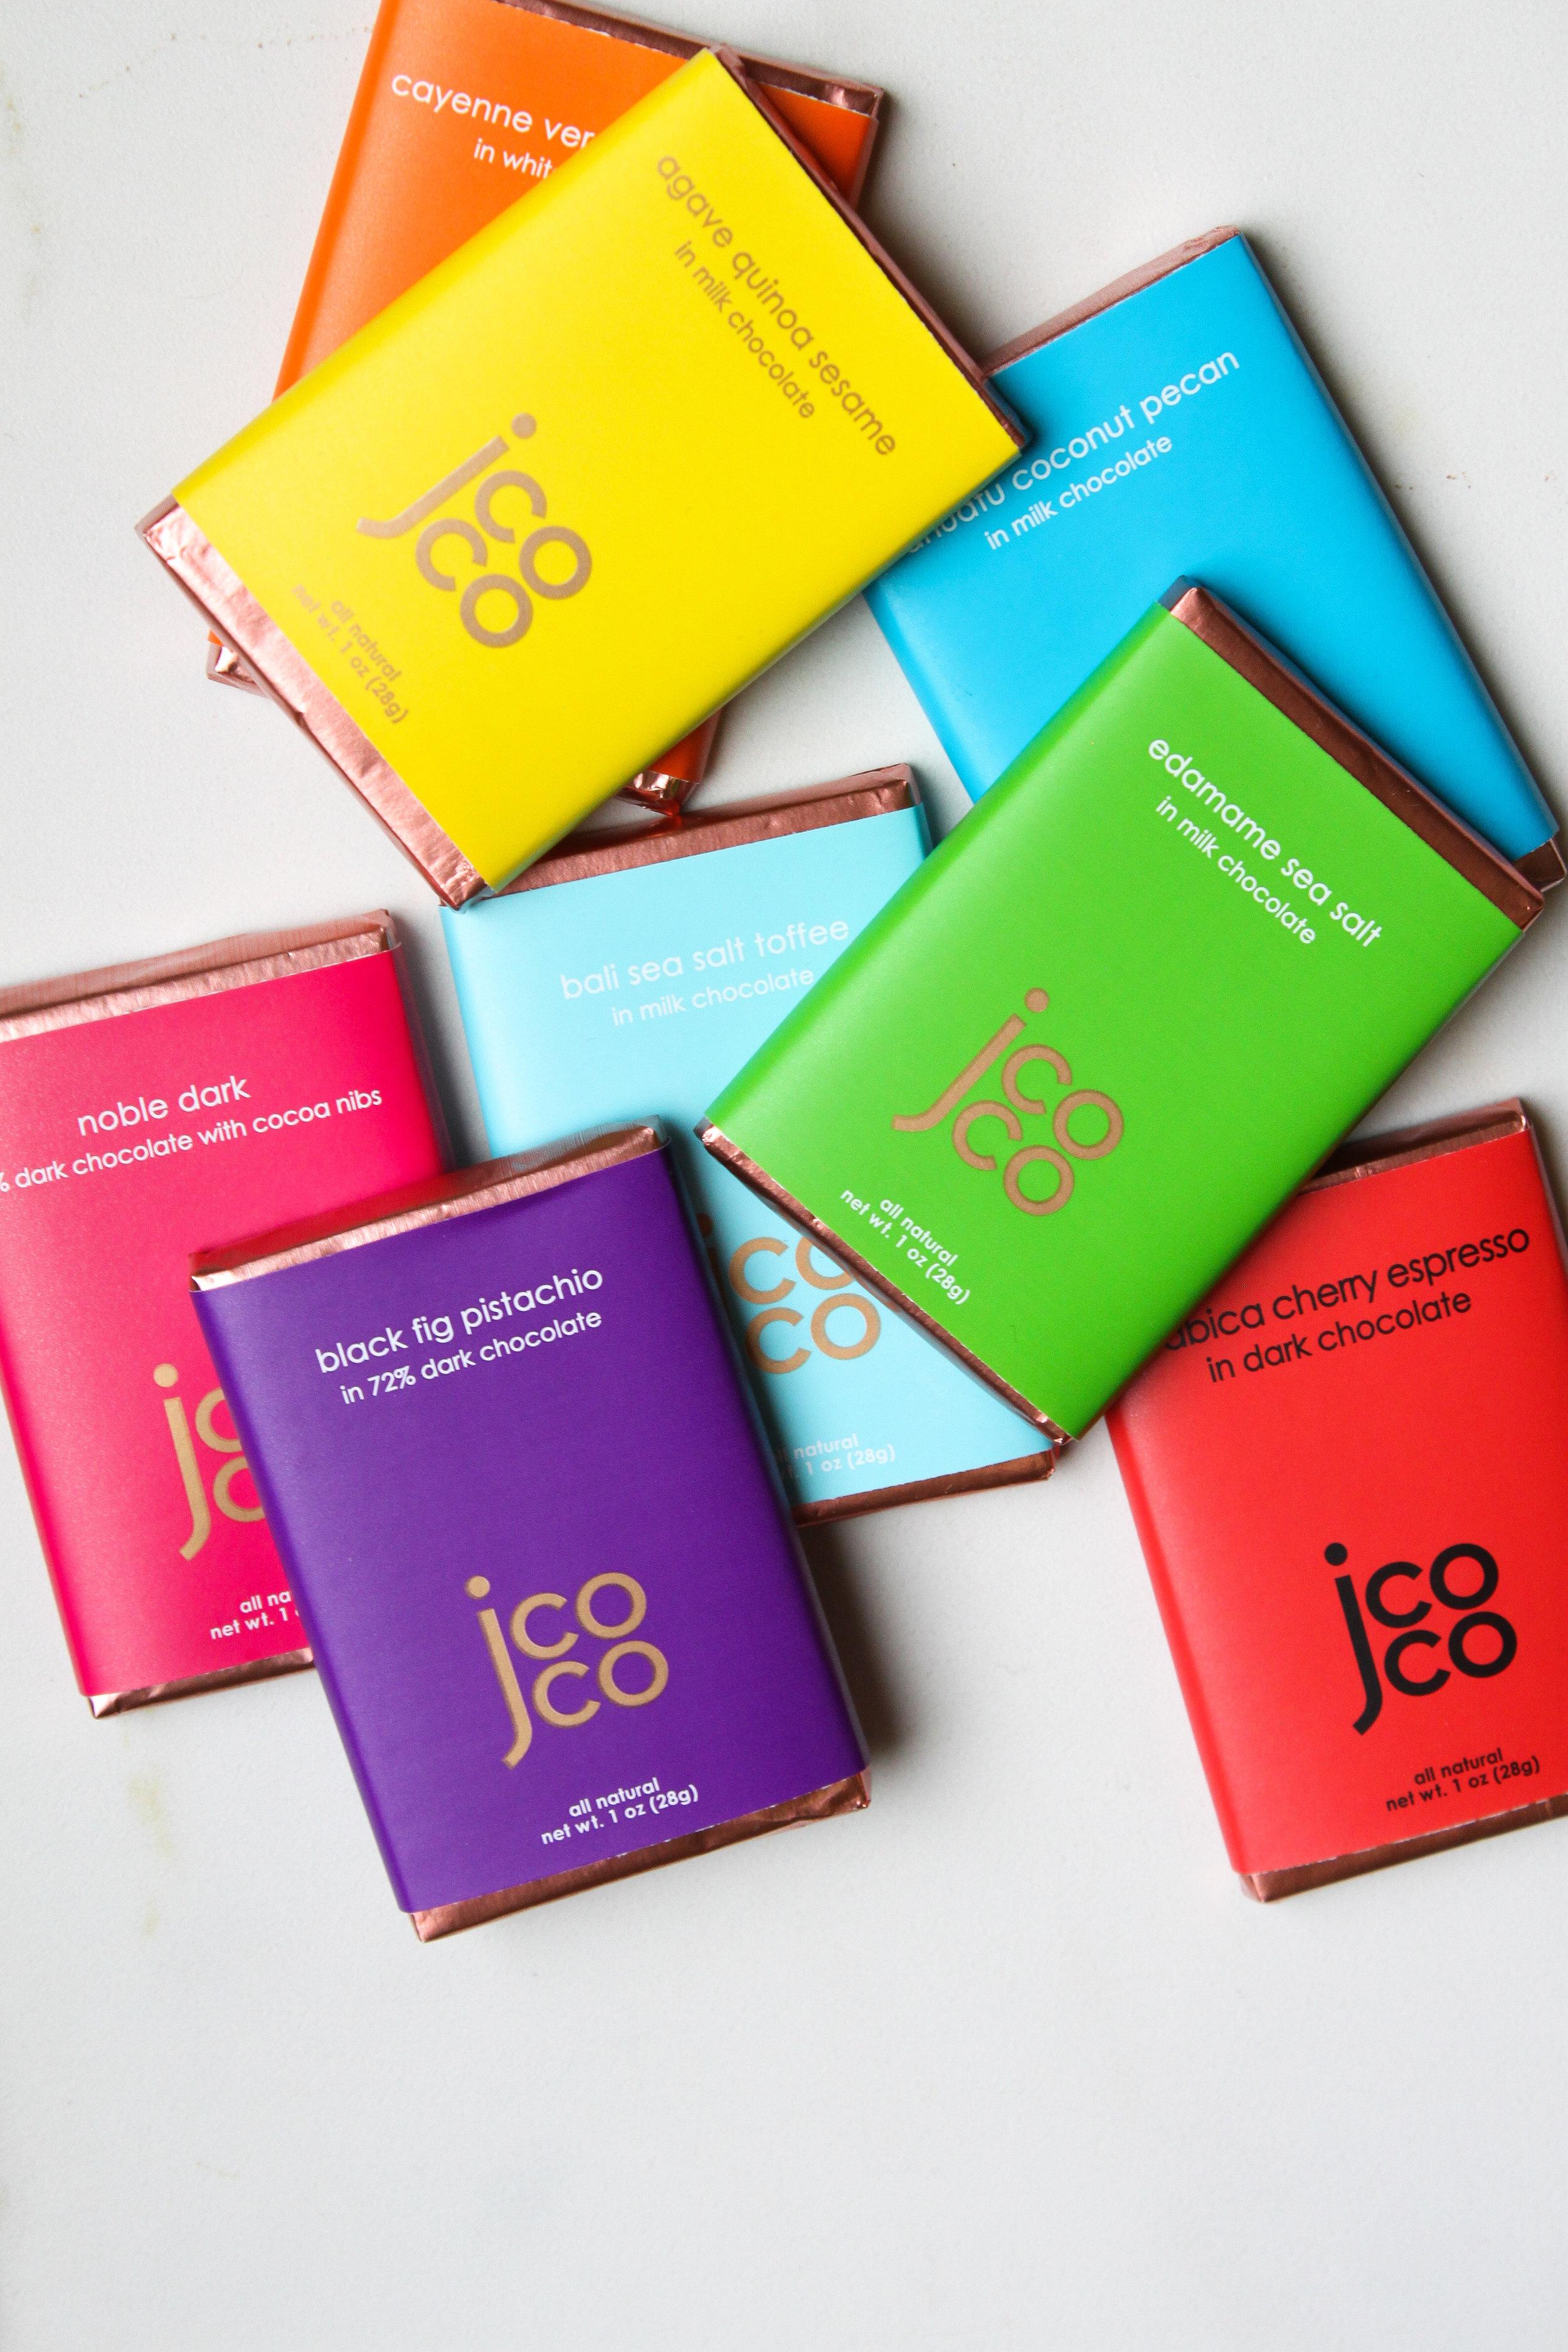 jcoco-5056.jpg